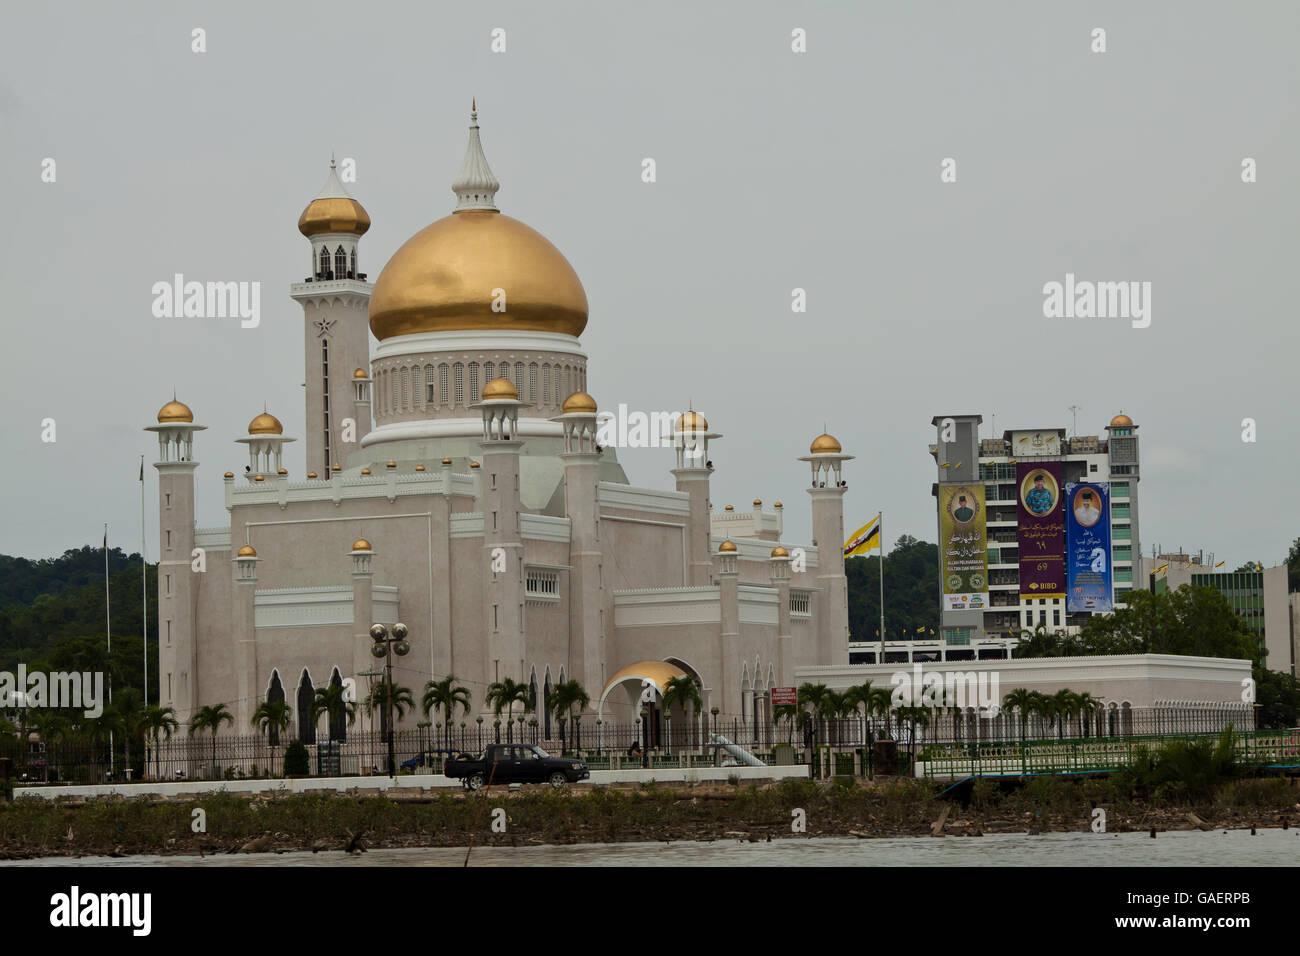 Sultan Omar Ali Saifuddin Mosque in Bandar Seri Begawan - Brunei - Stock Image